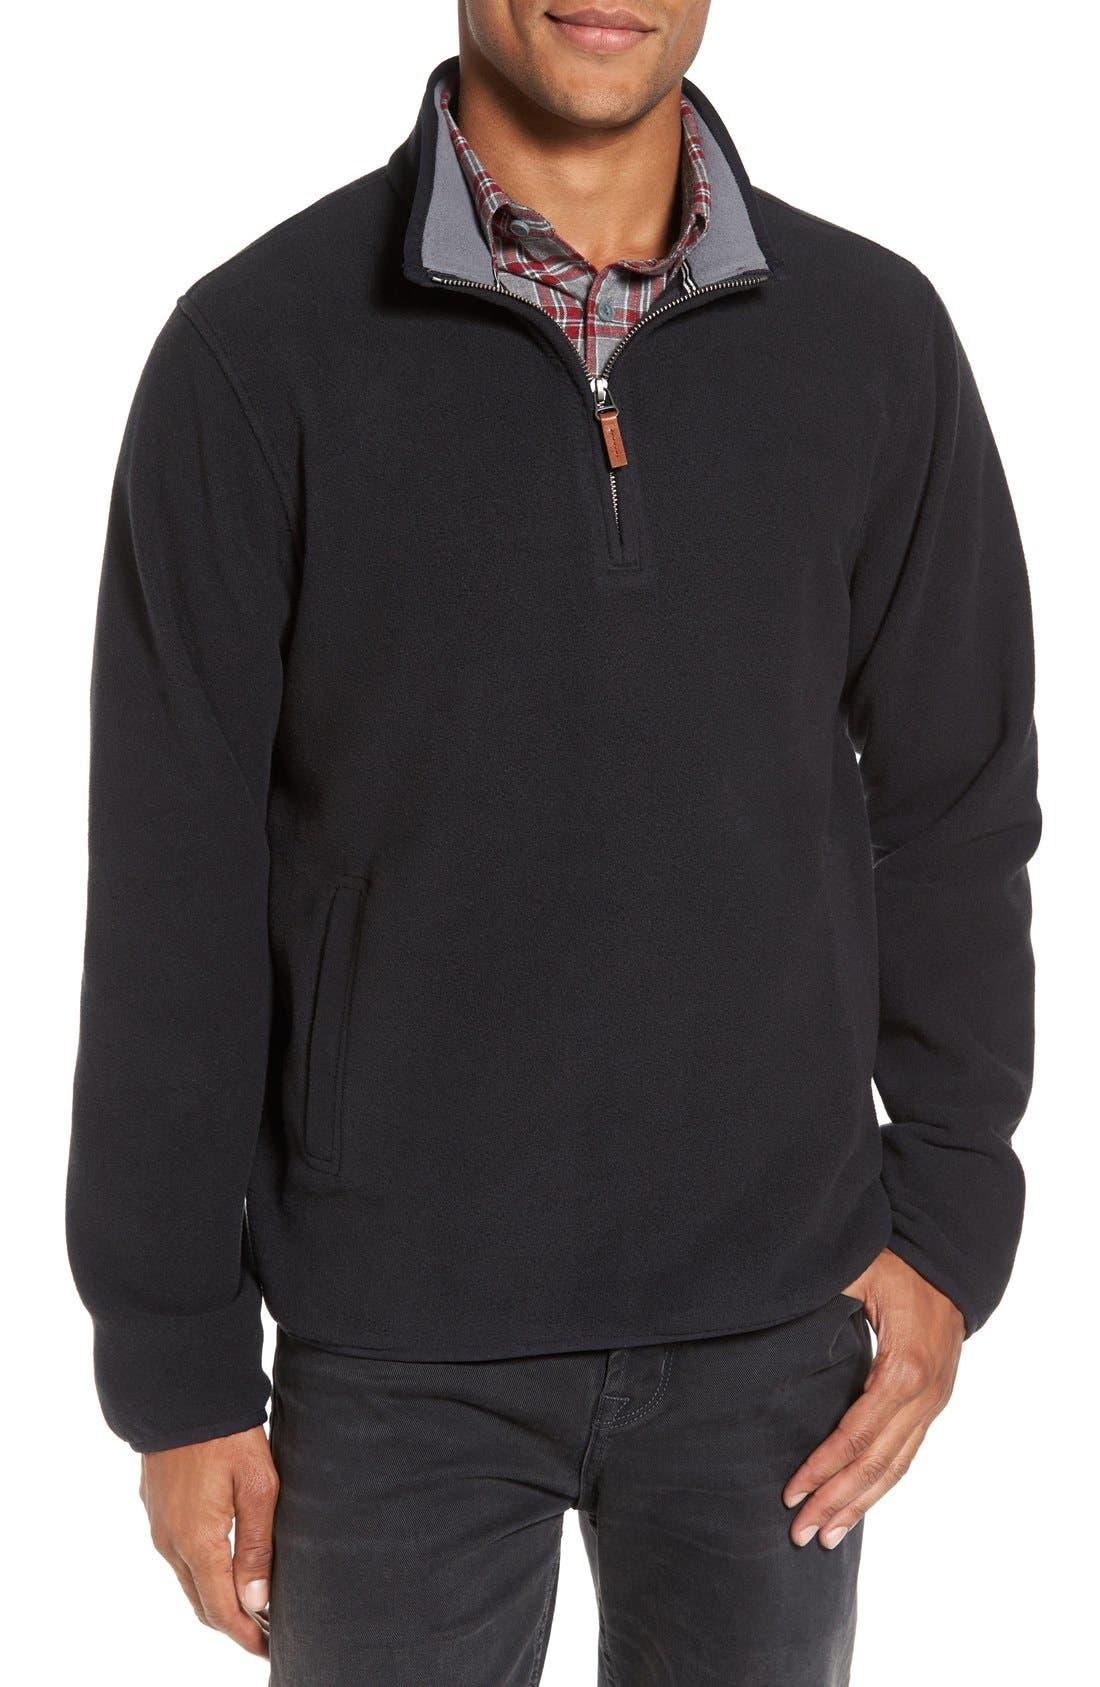 Alternate Image 1 Selected - Nordstrom Men's Shop Polar Fleece Quarter Zip Pullover (Regular & Tall)